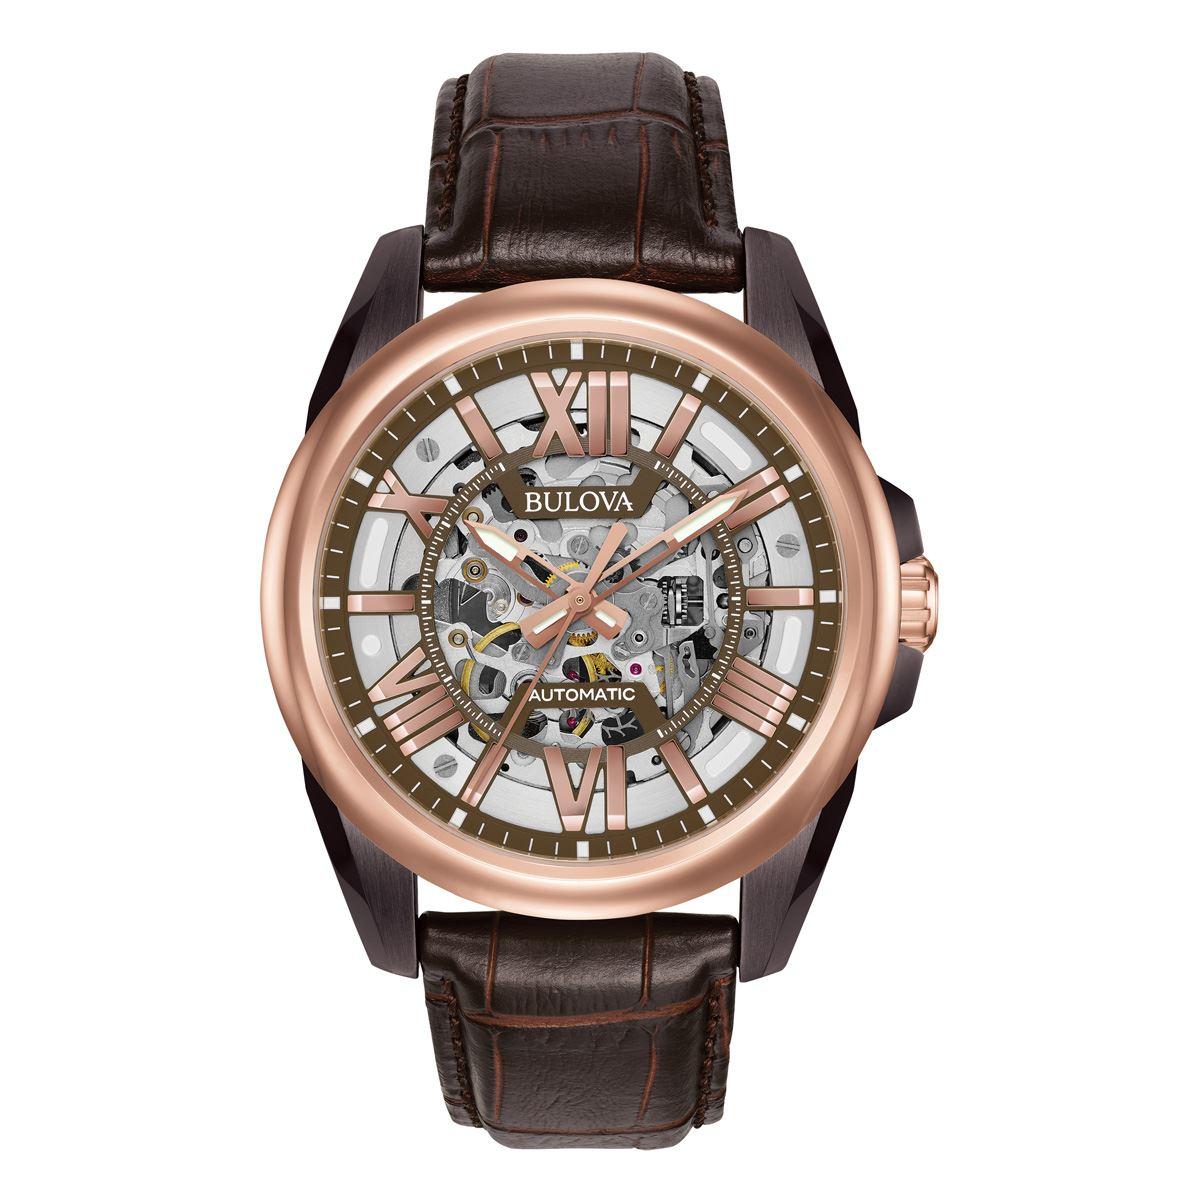 Reloj Bulova Mecánico de Cuerda Automática para Caballero 98A165